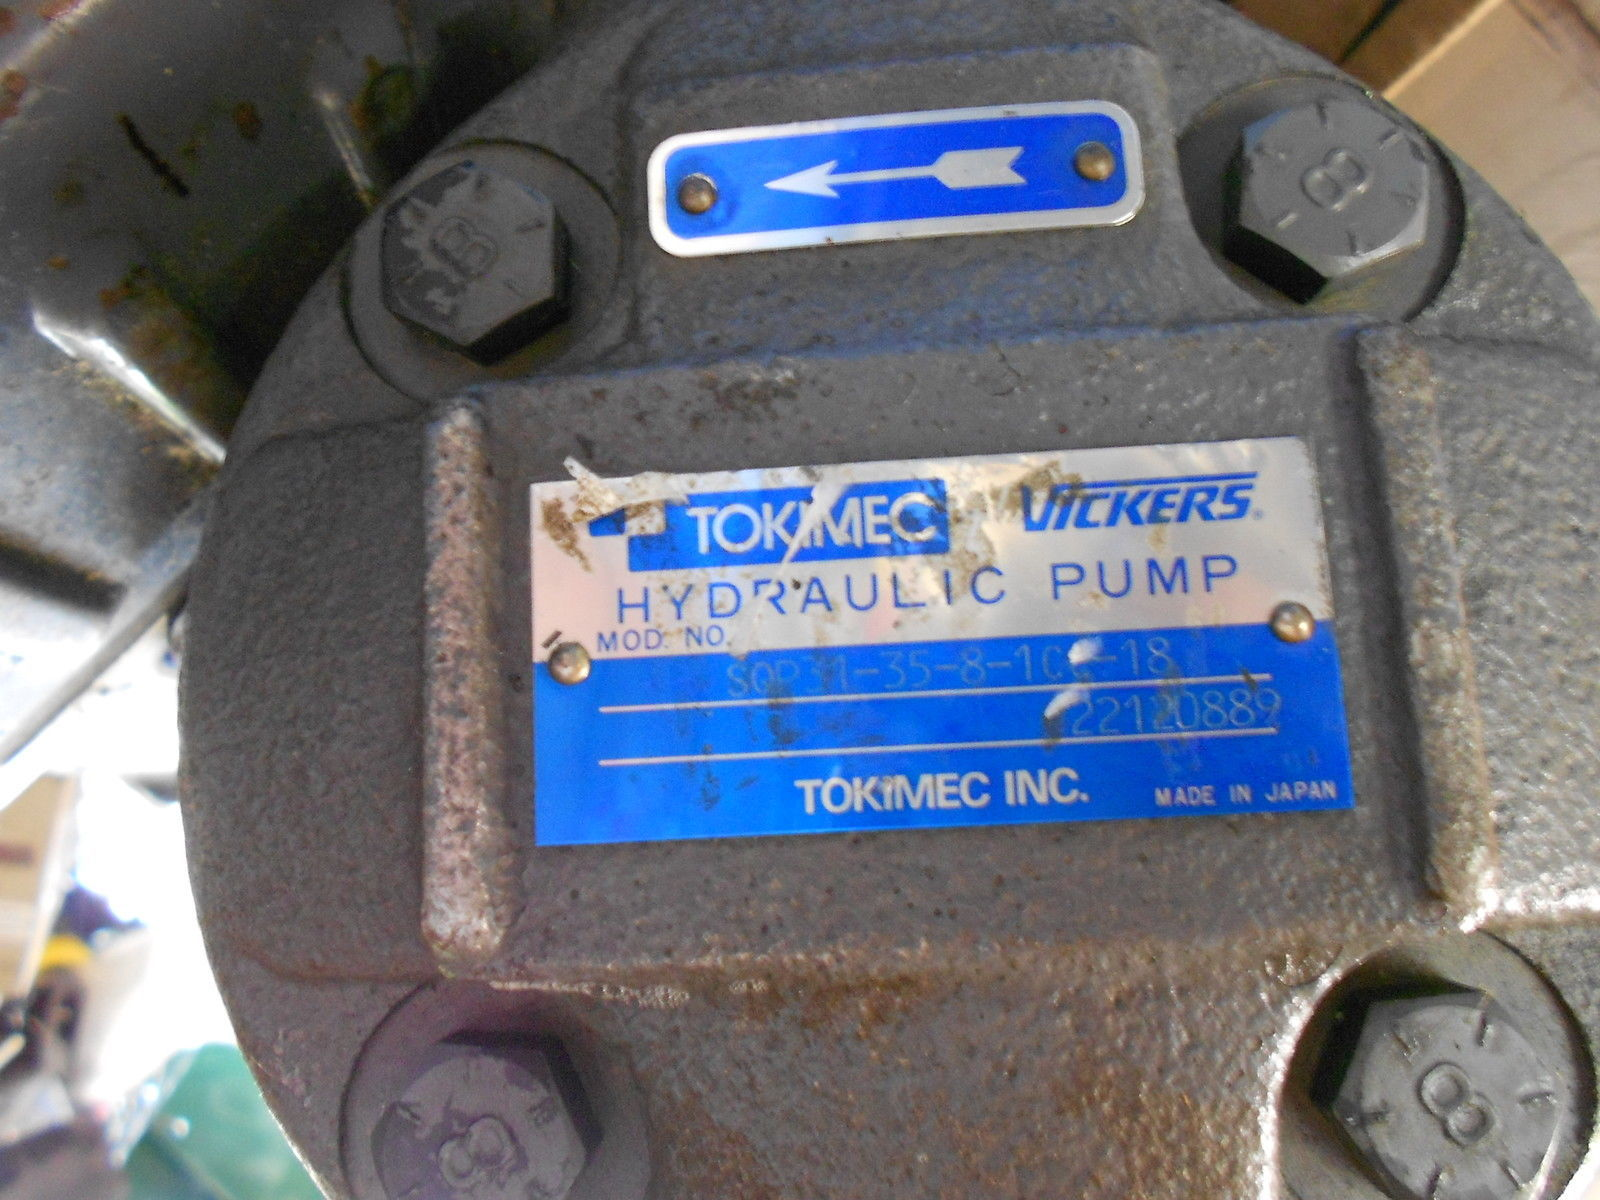 TOKIMEC VICKERS SQP31 33 8 1CC 18 HYDRAULIC PUMP INDUSTRIAL  MANUFACTURING TOOL